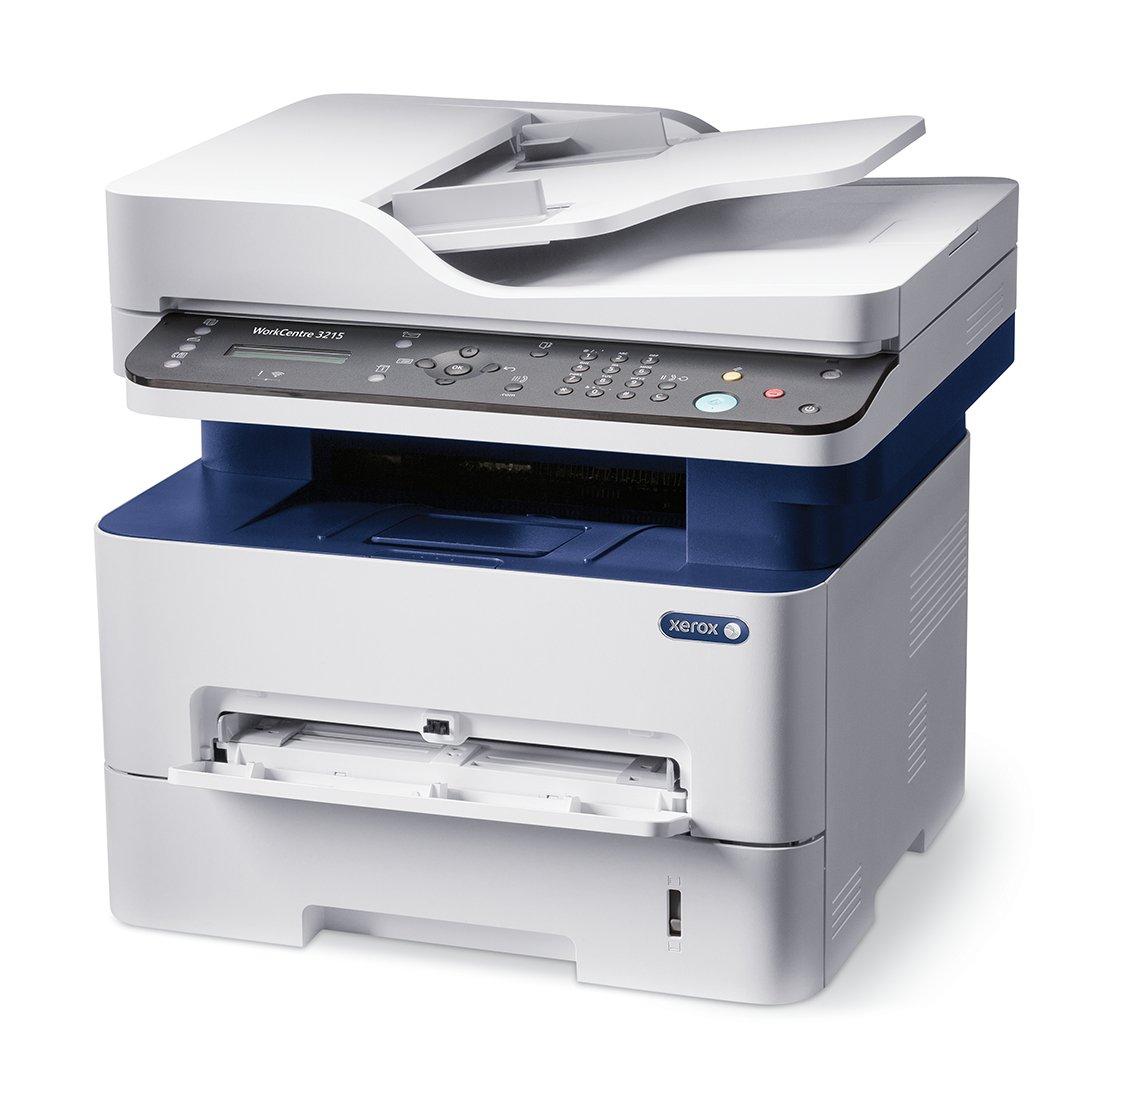 amazon com xerox workcentre 3215 ni monochrome multifunction rh amazon com Xeox Controller Xerox Printer